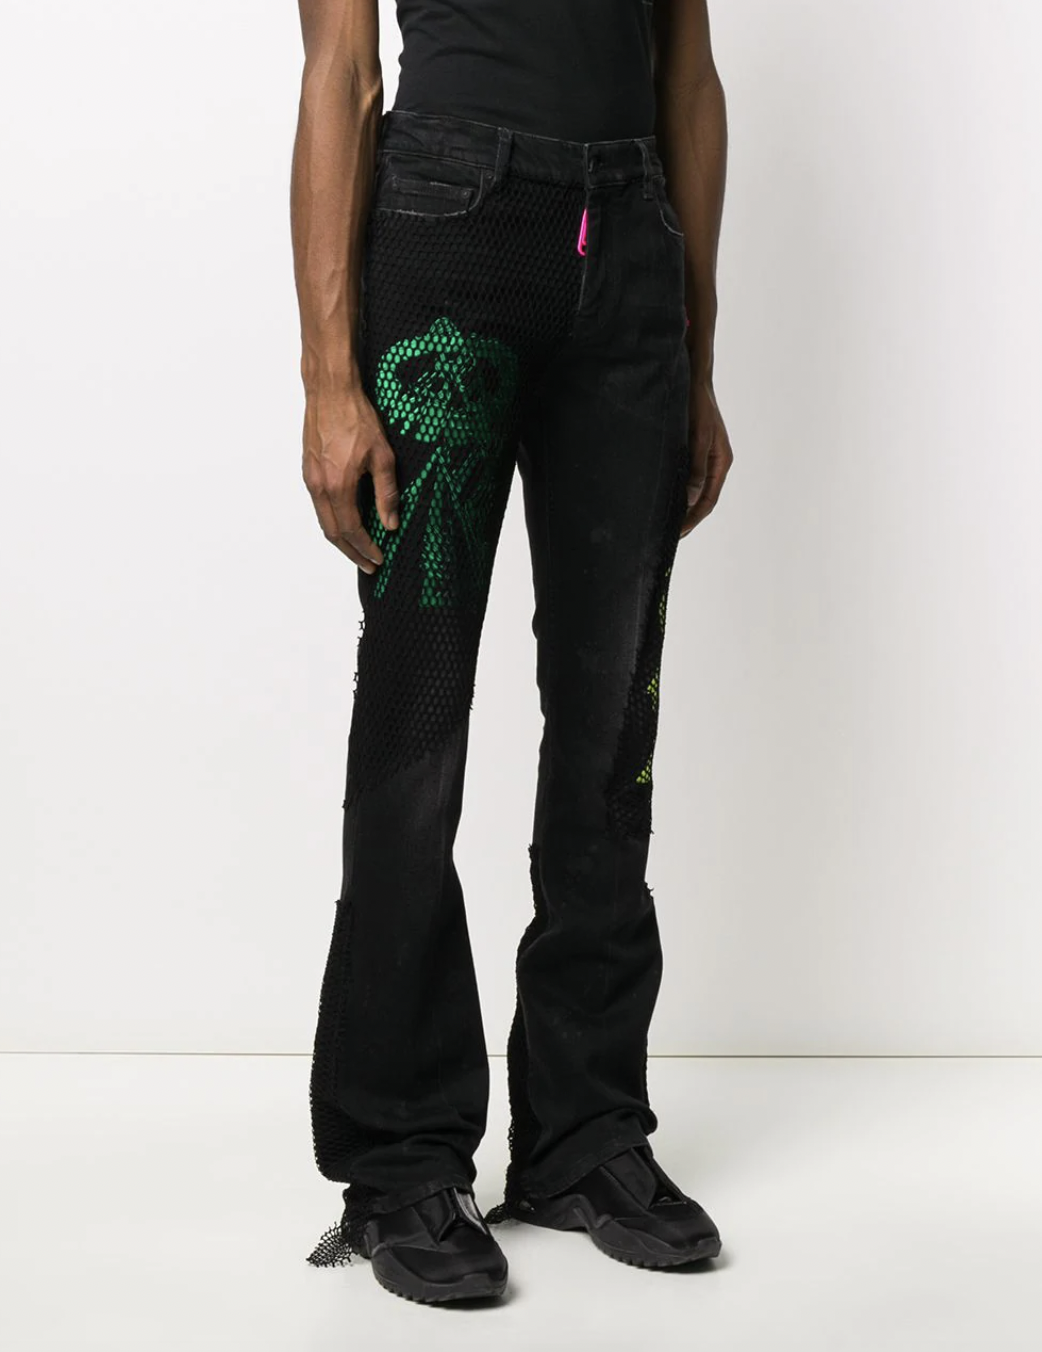 off-white black jeans